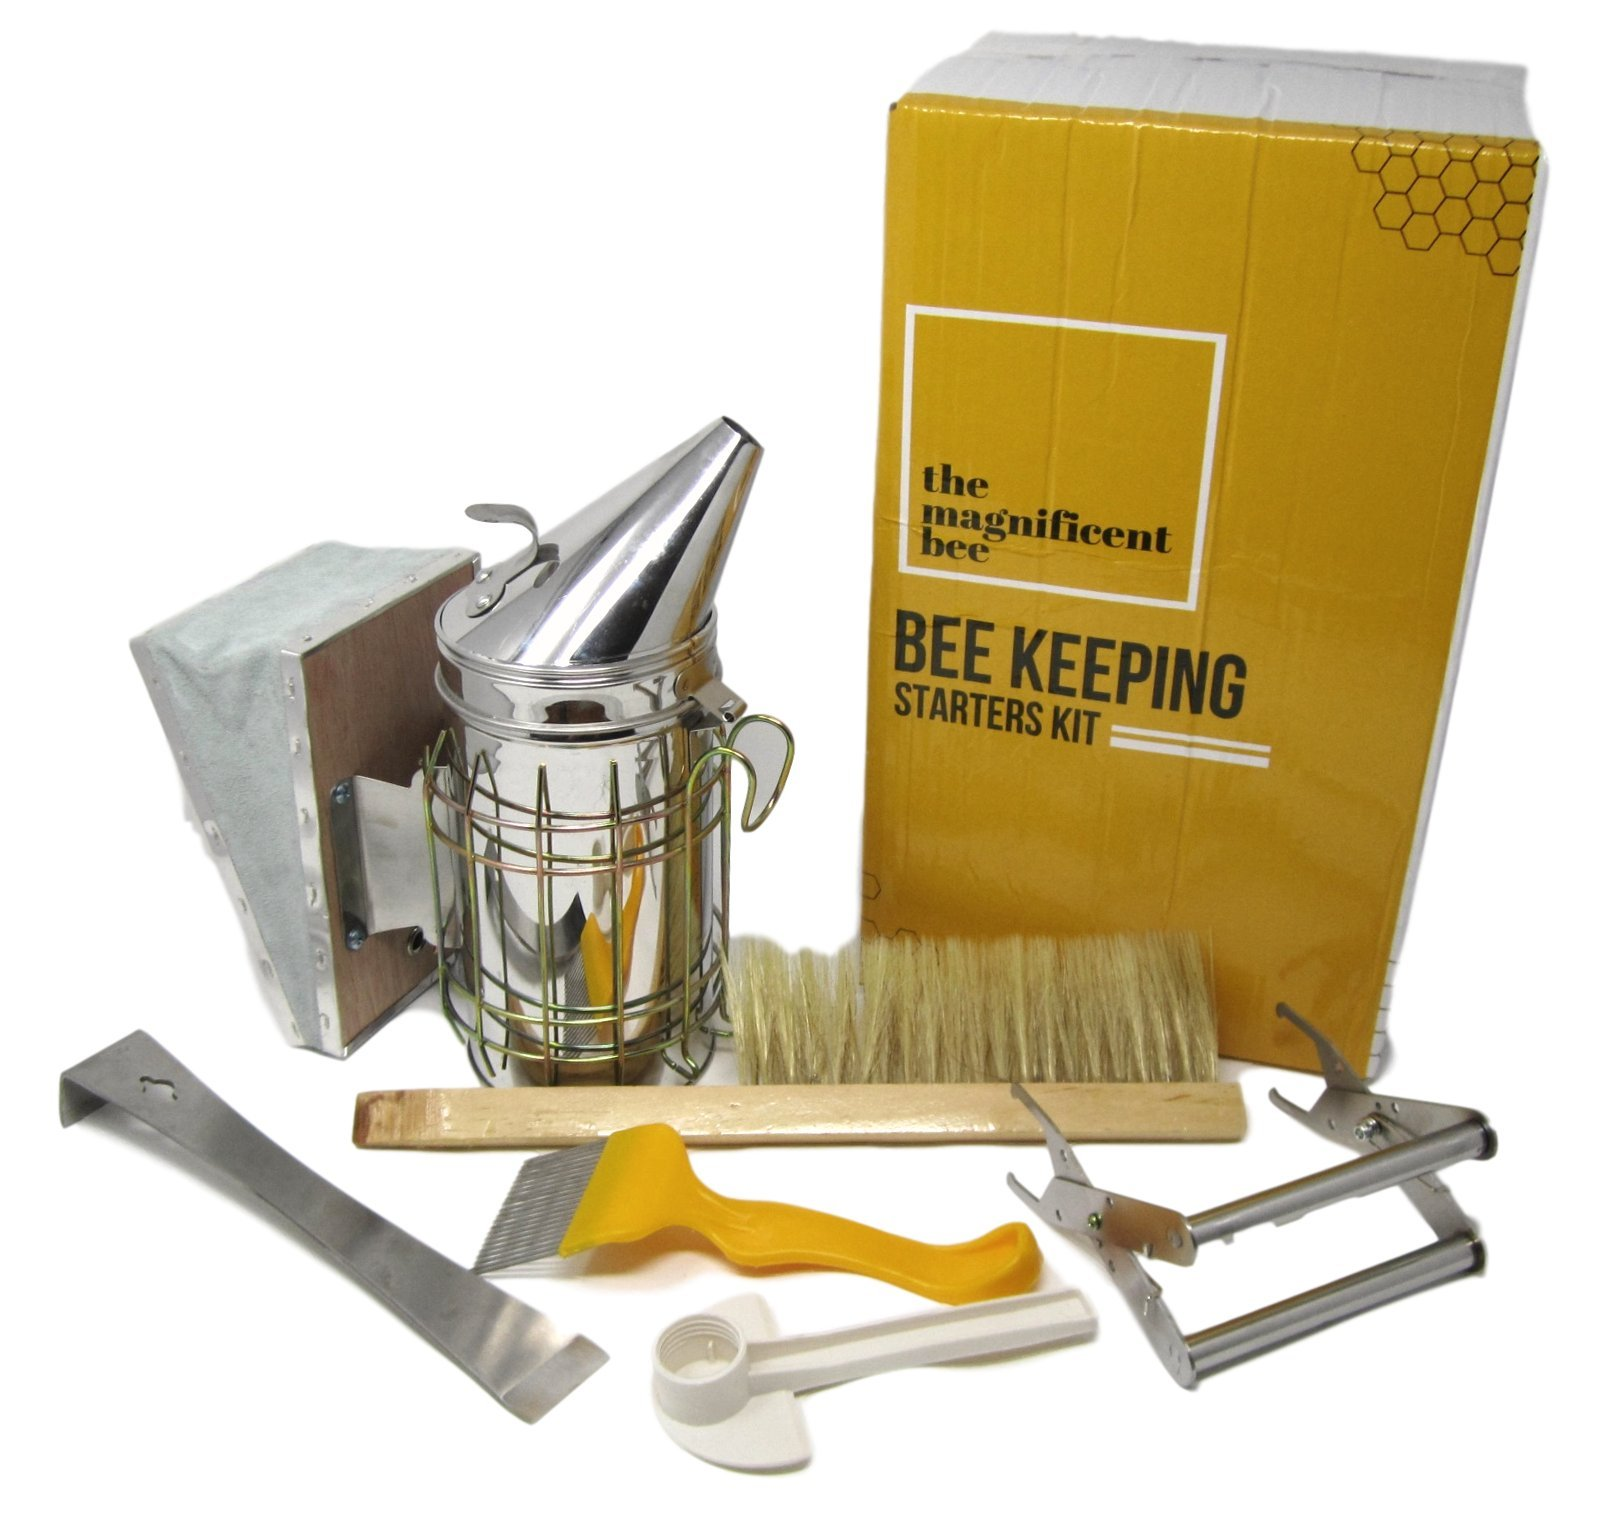 6 Piece Beekeeping Supplies Starters Kit - Bee Hive Smoker, Uncapping Fork Tool, Bee Brush, Frame Grip, Extracting Scraper, Bee Feeder Tool